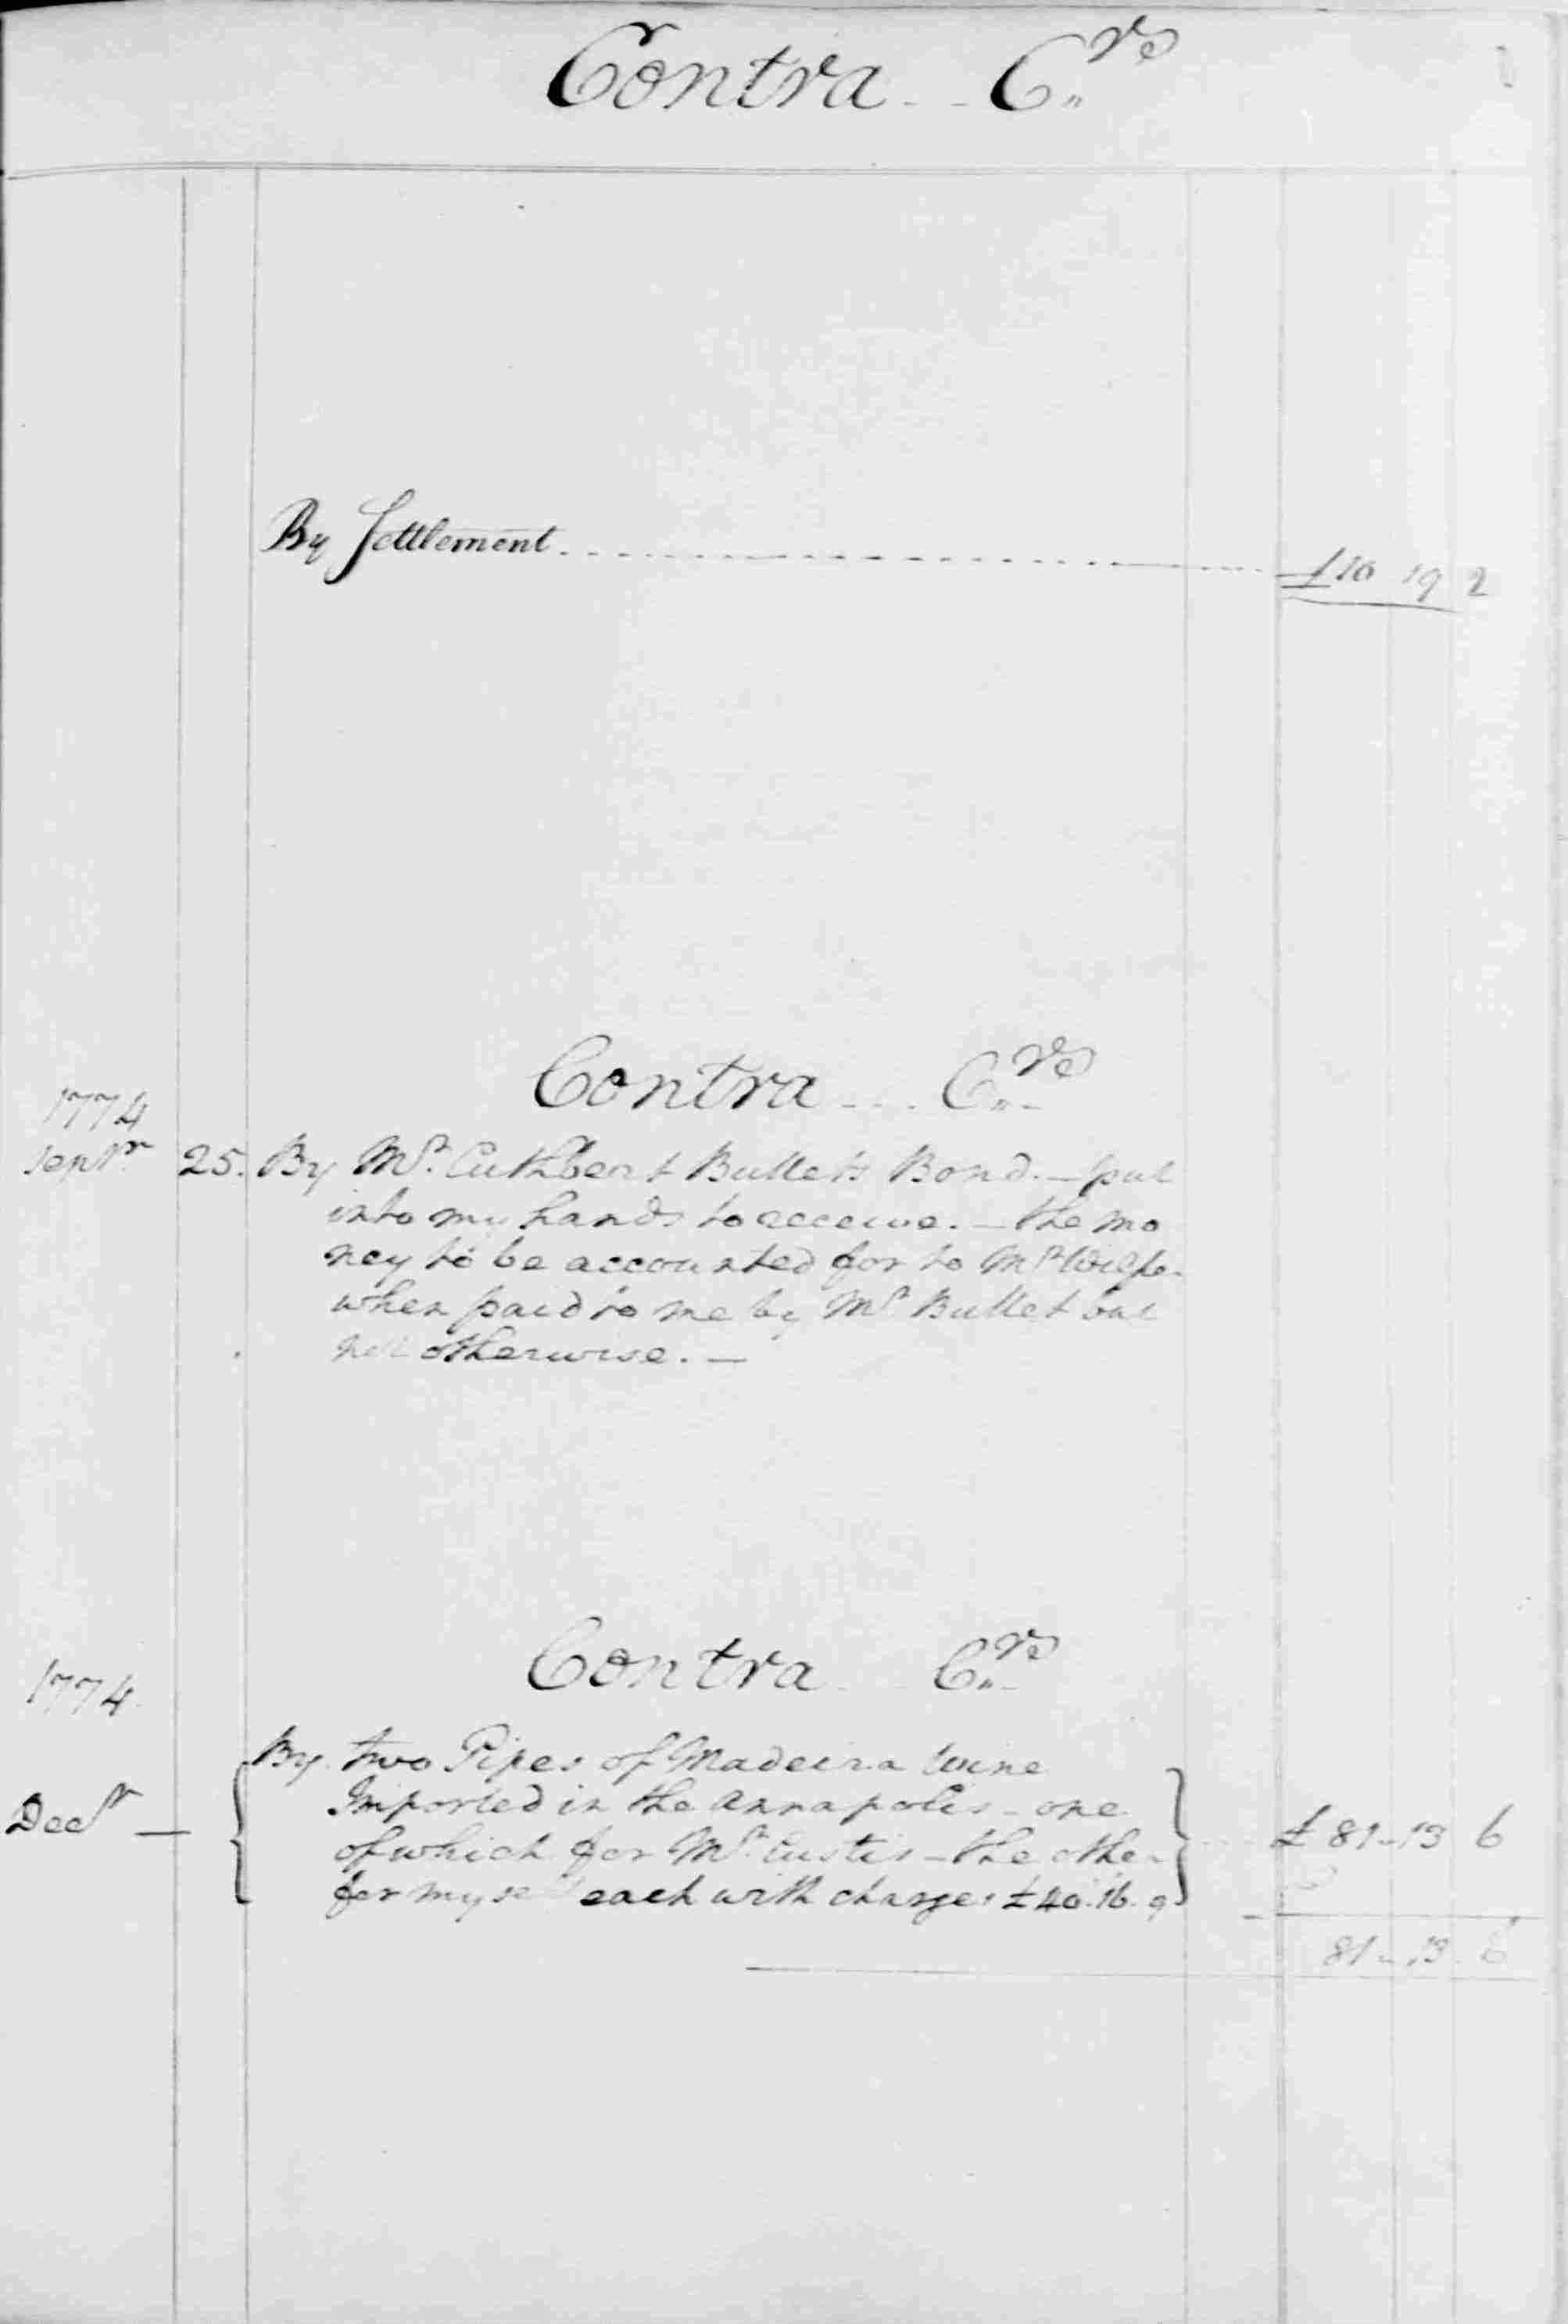 Ledger B, folio 122, right side